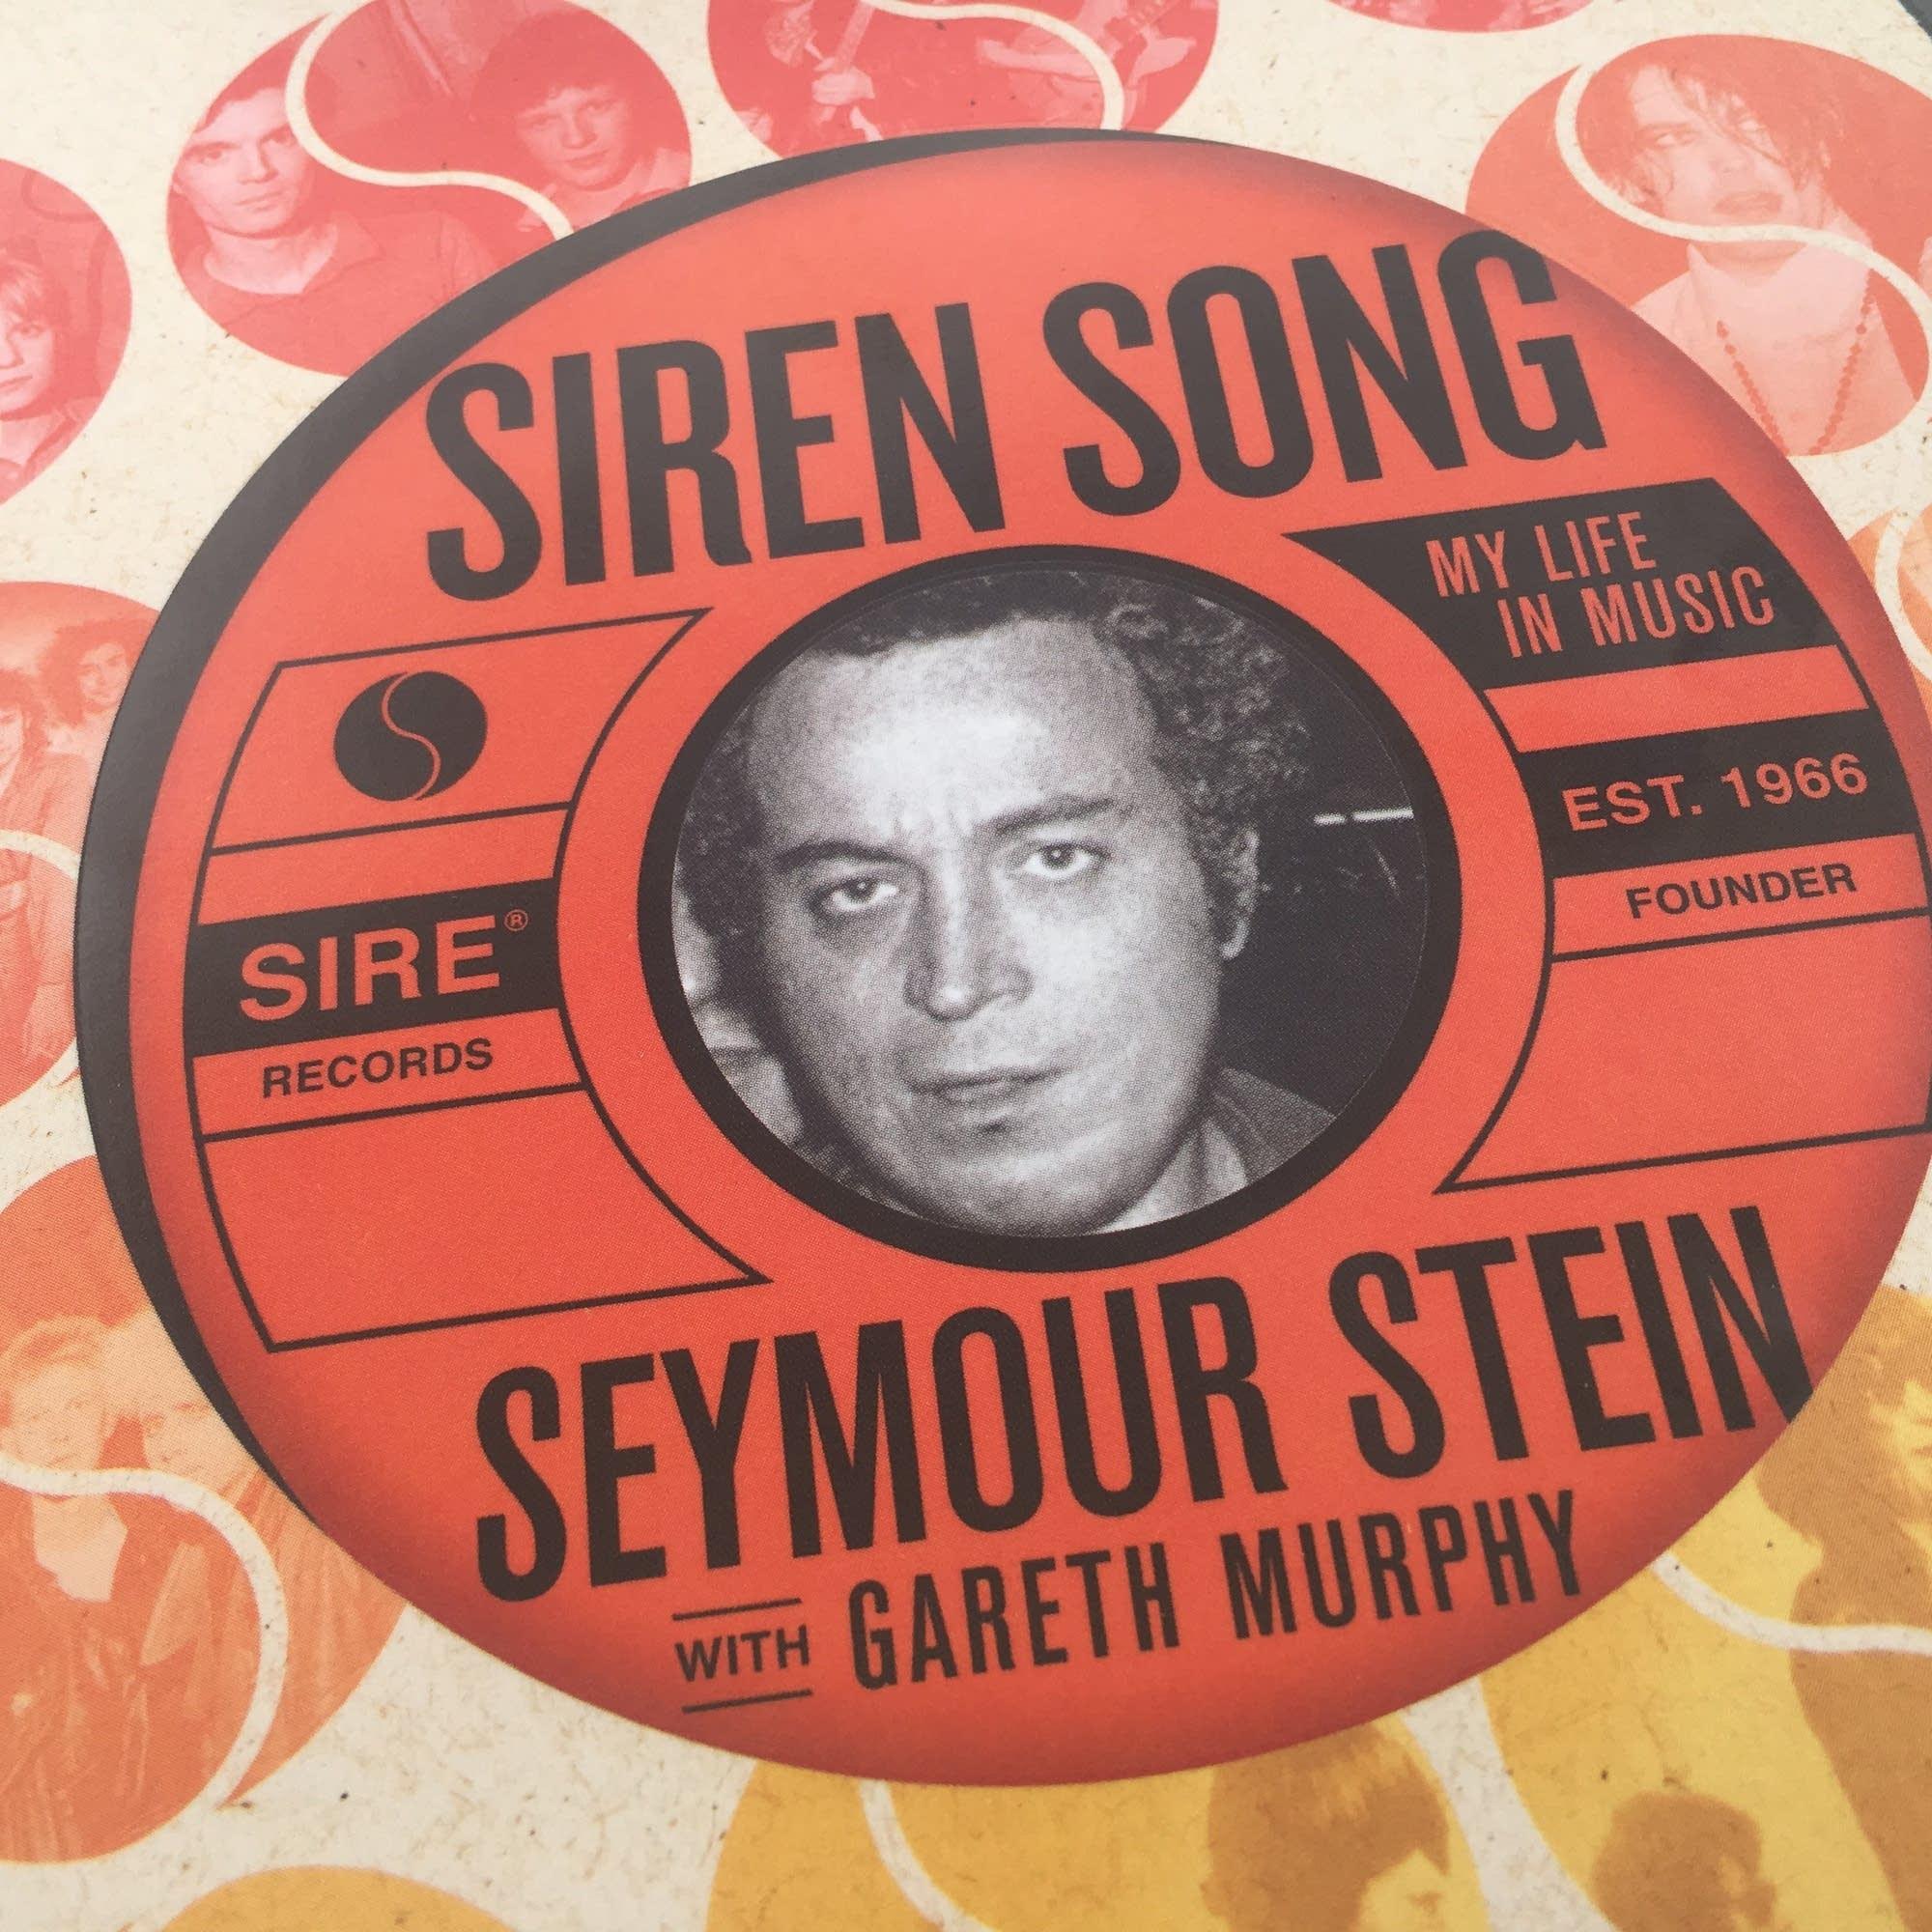 Seymour Stein's autobiography 'Siren Song.'